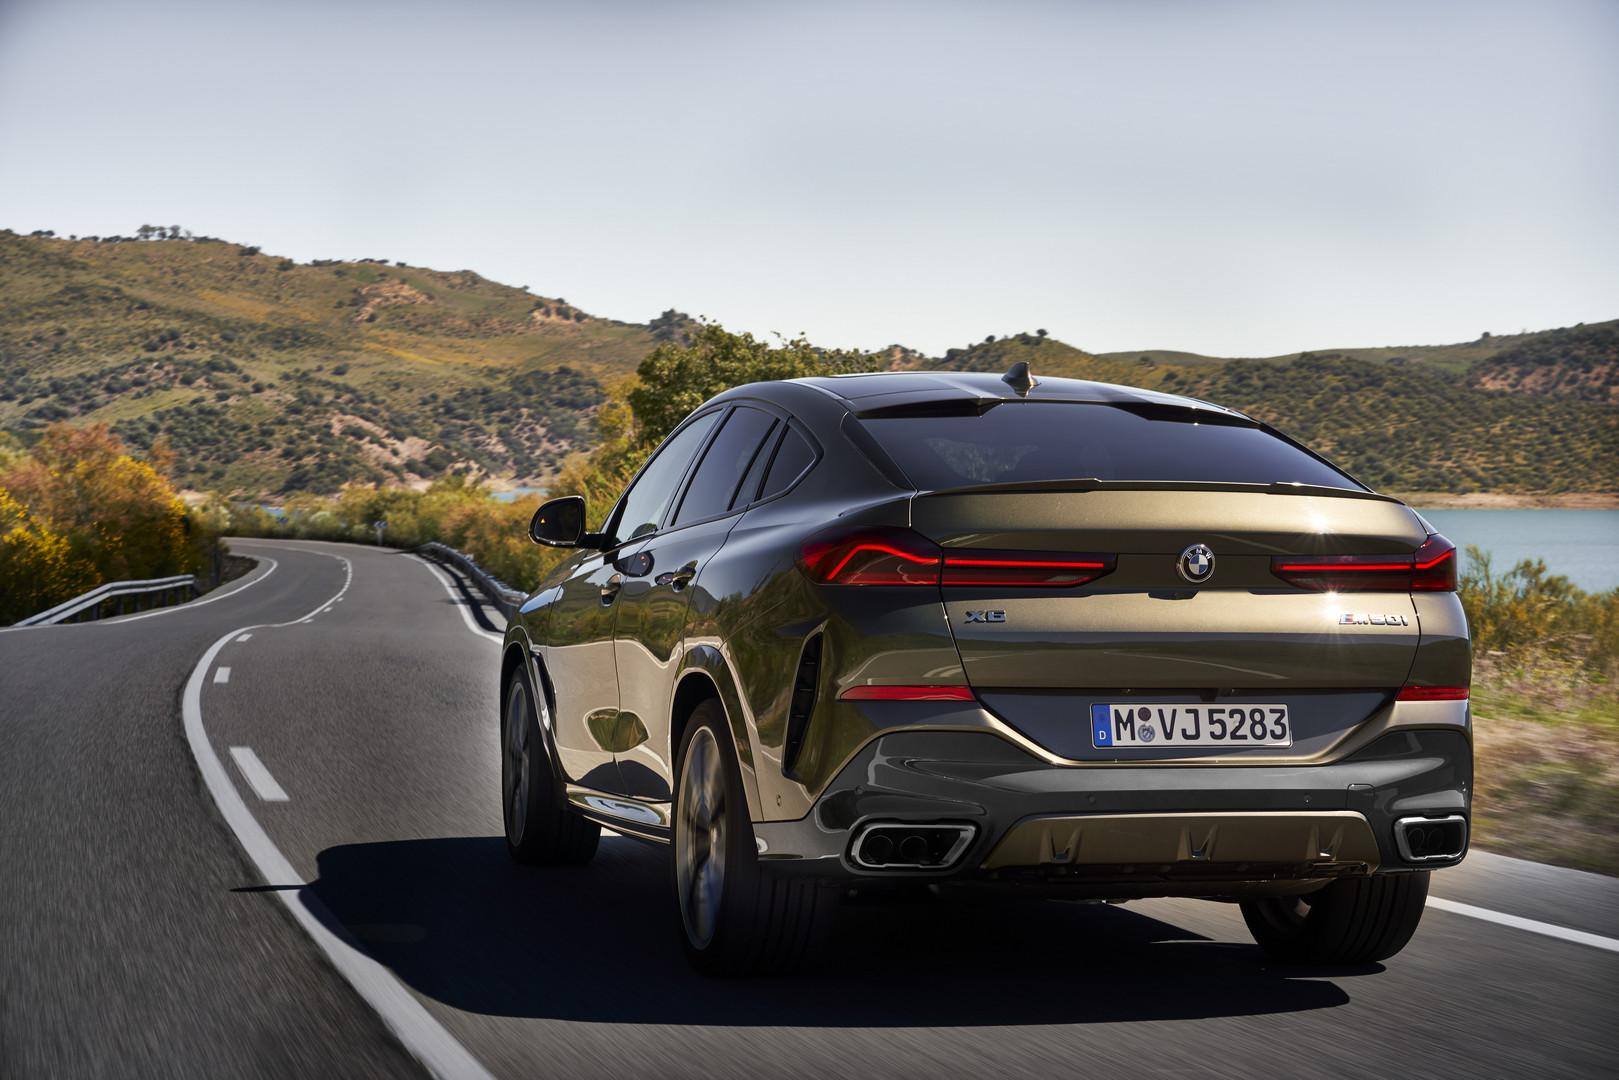 2020 BMW X6 M50i Rear